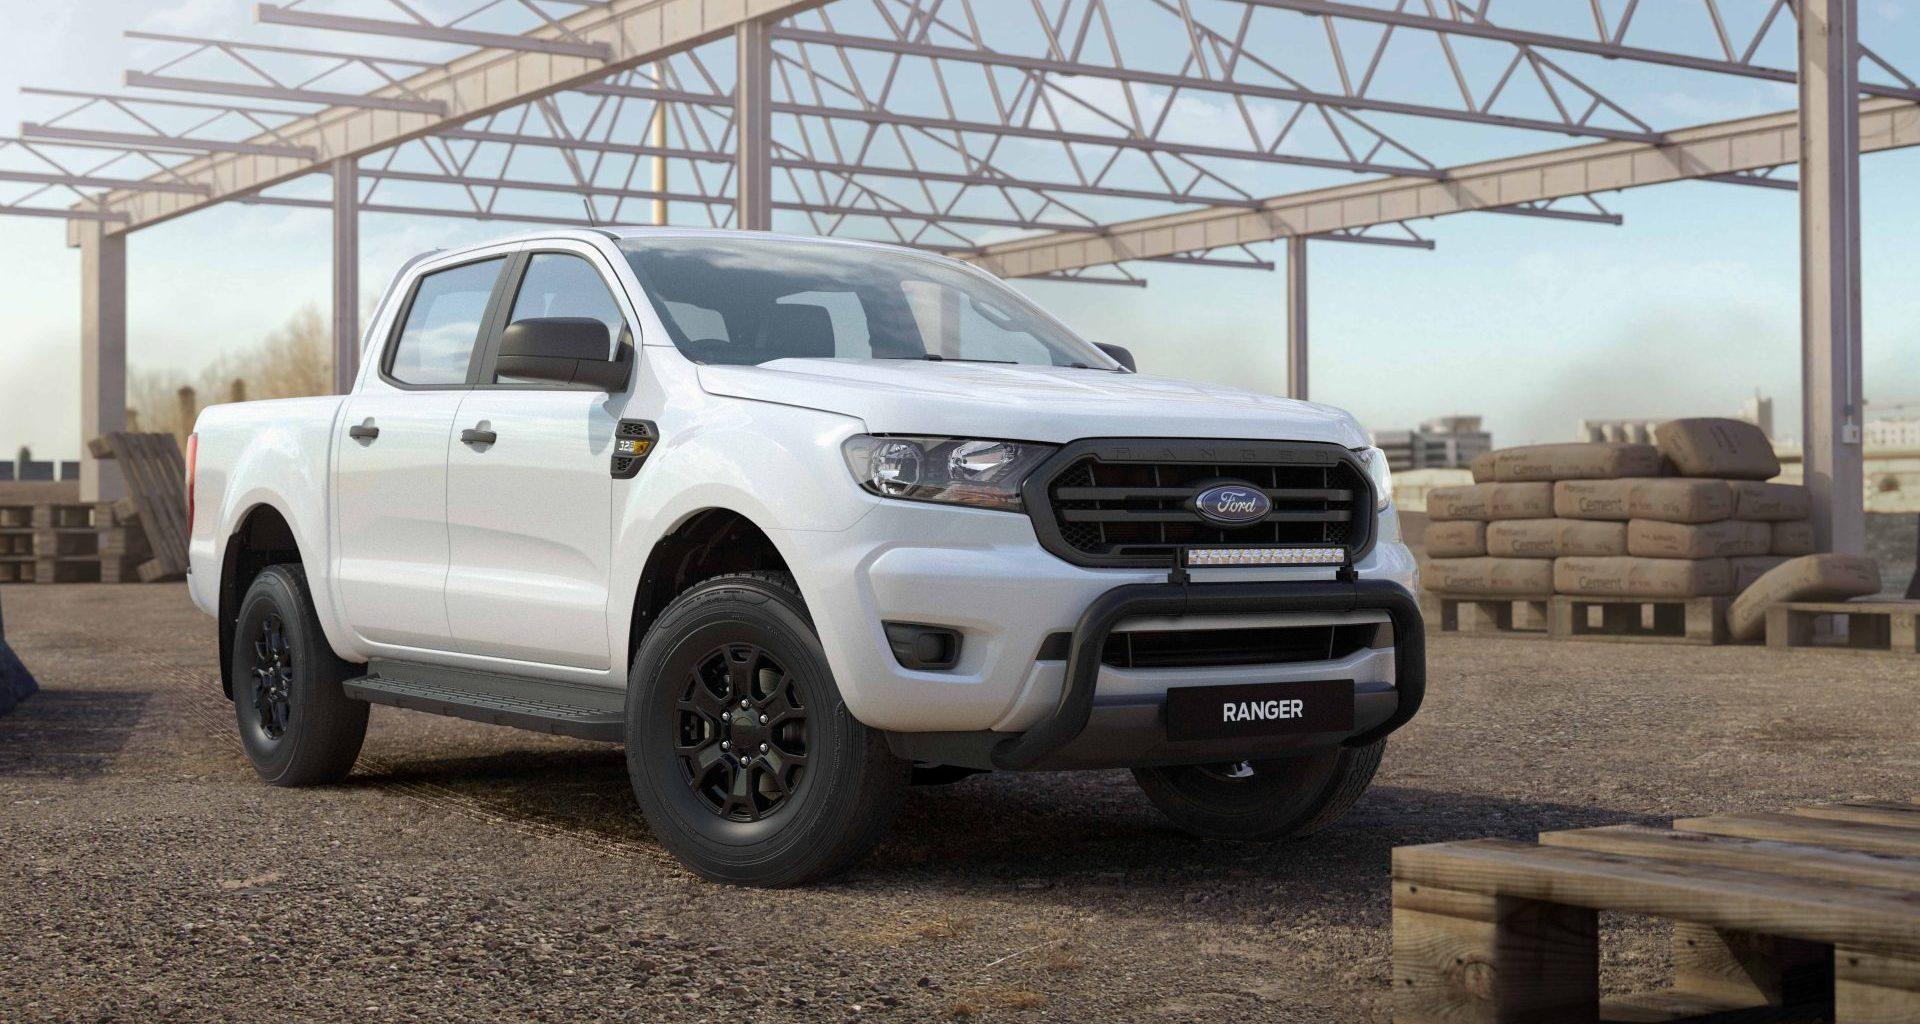 Ford Ranger Tradie